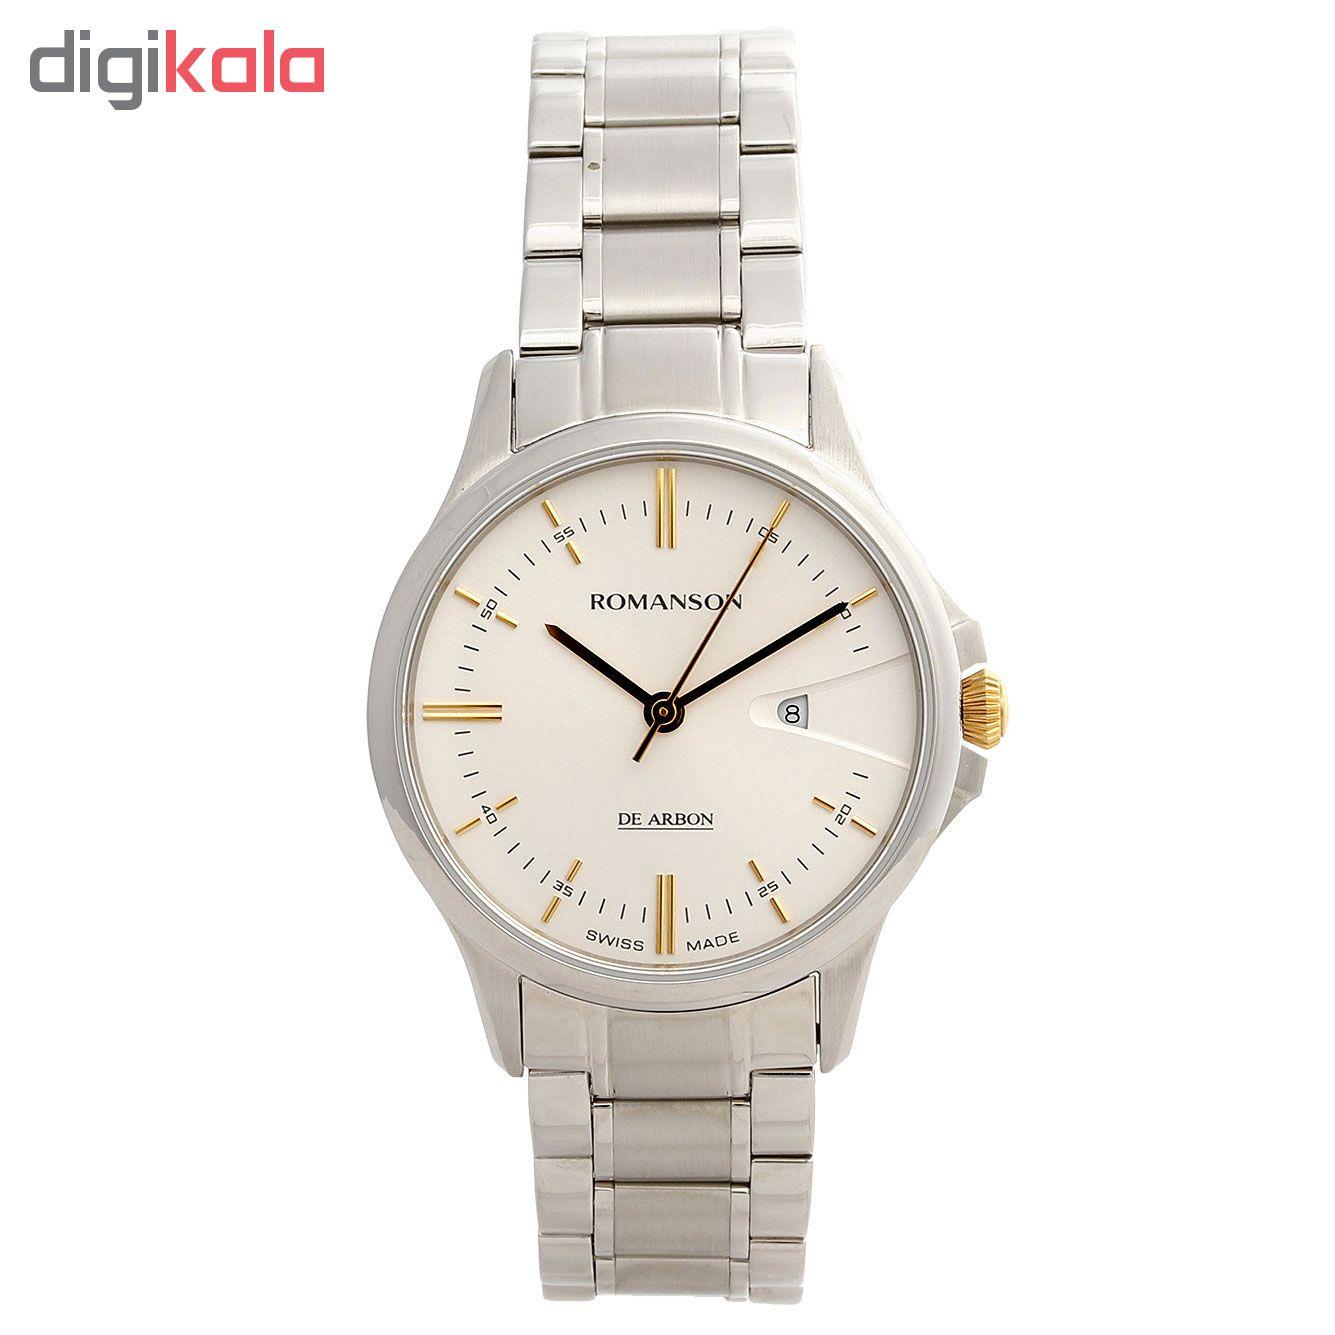 ساعت زنانه برند رومانسون مدل CM5A10LL1CA1R2